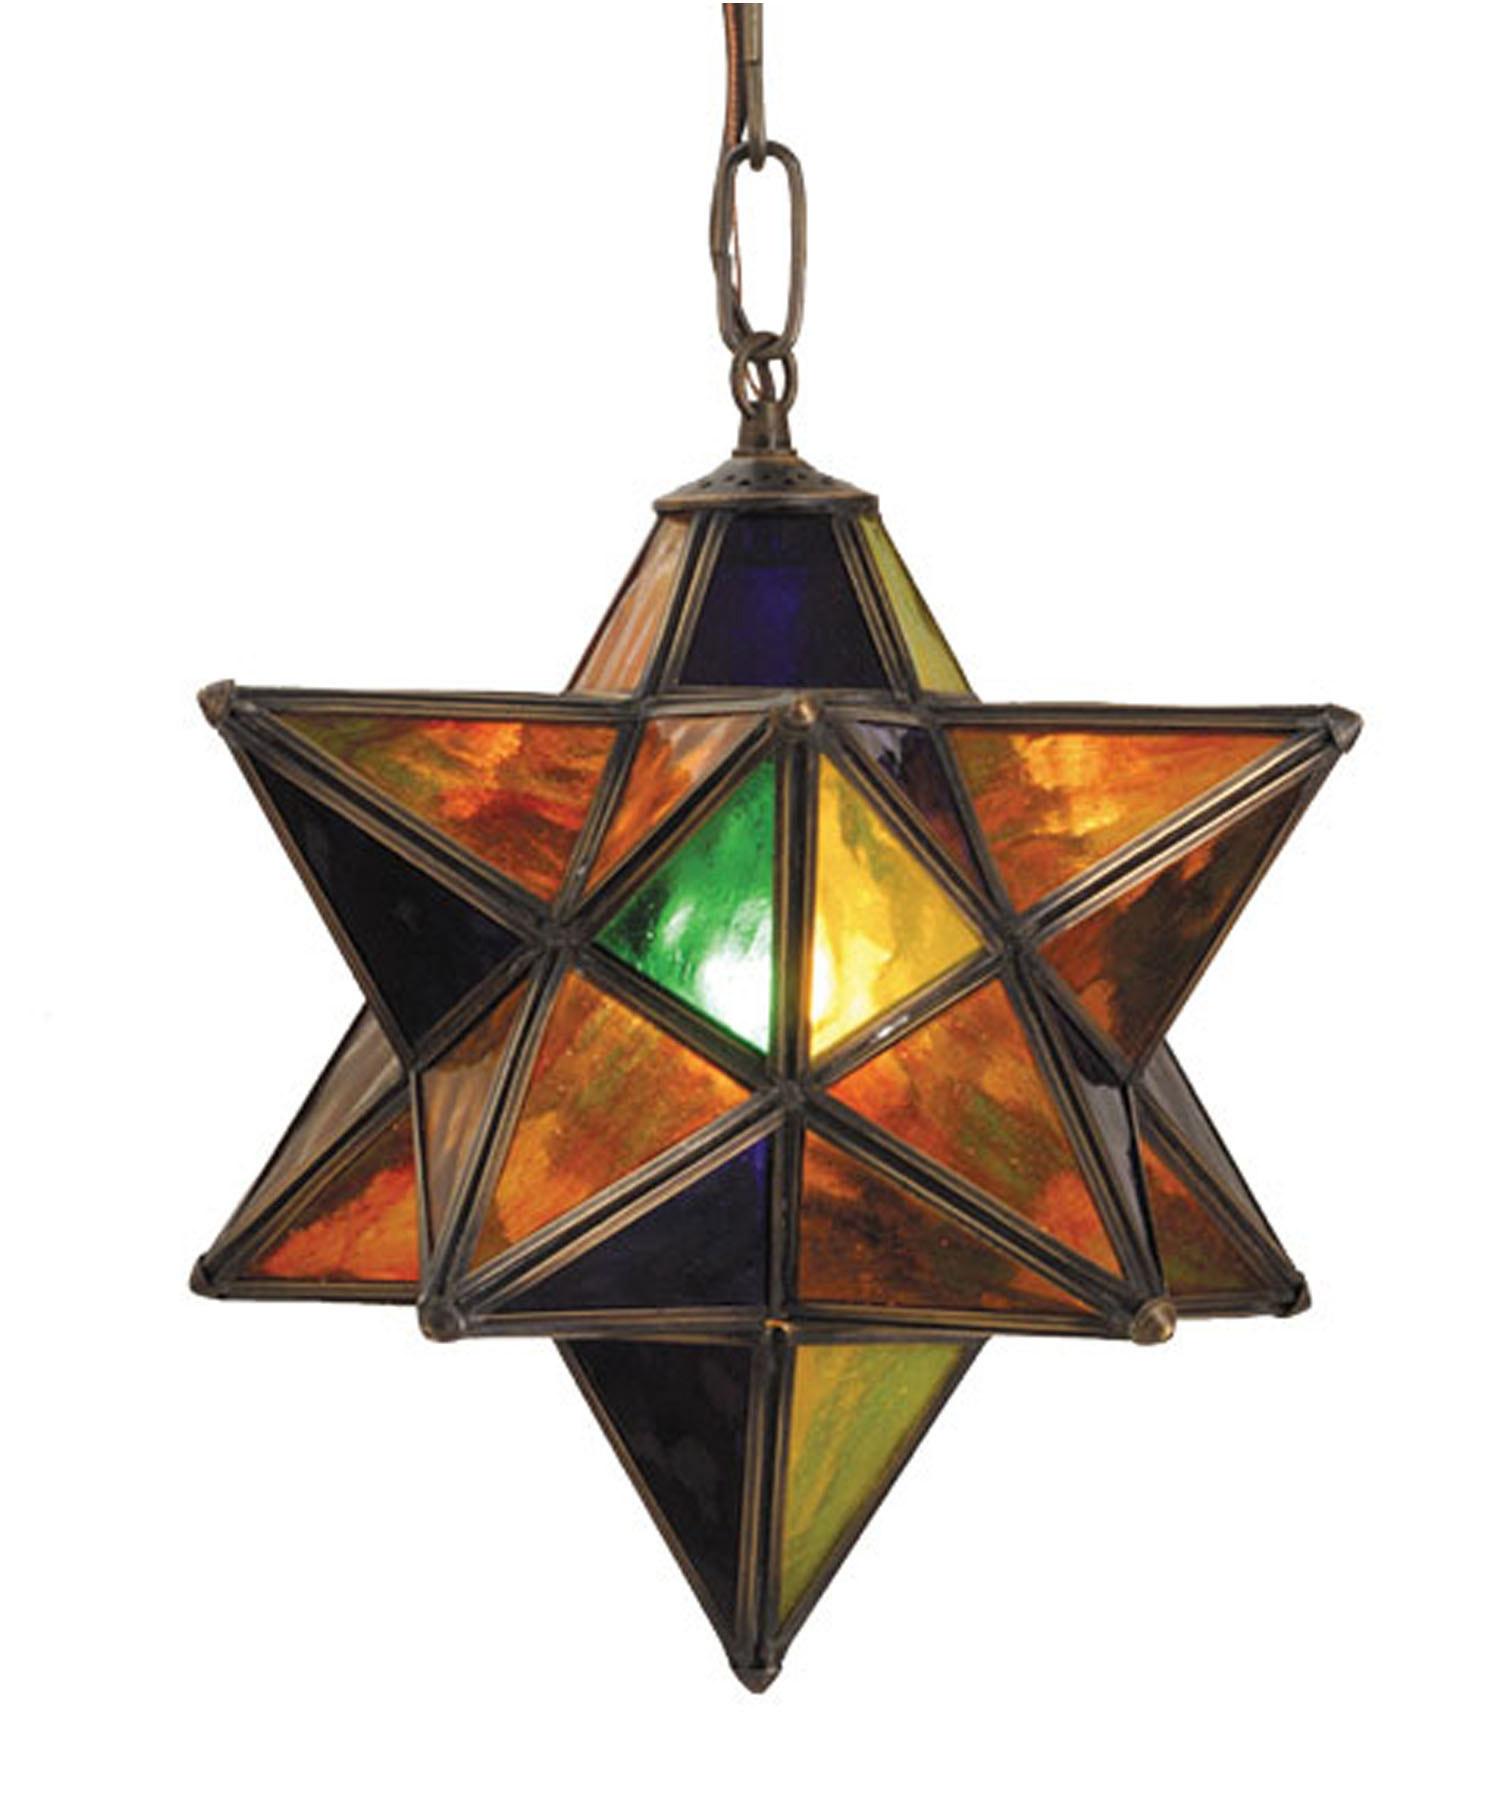 meyda 72849 moravian pendant